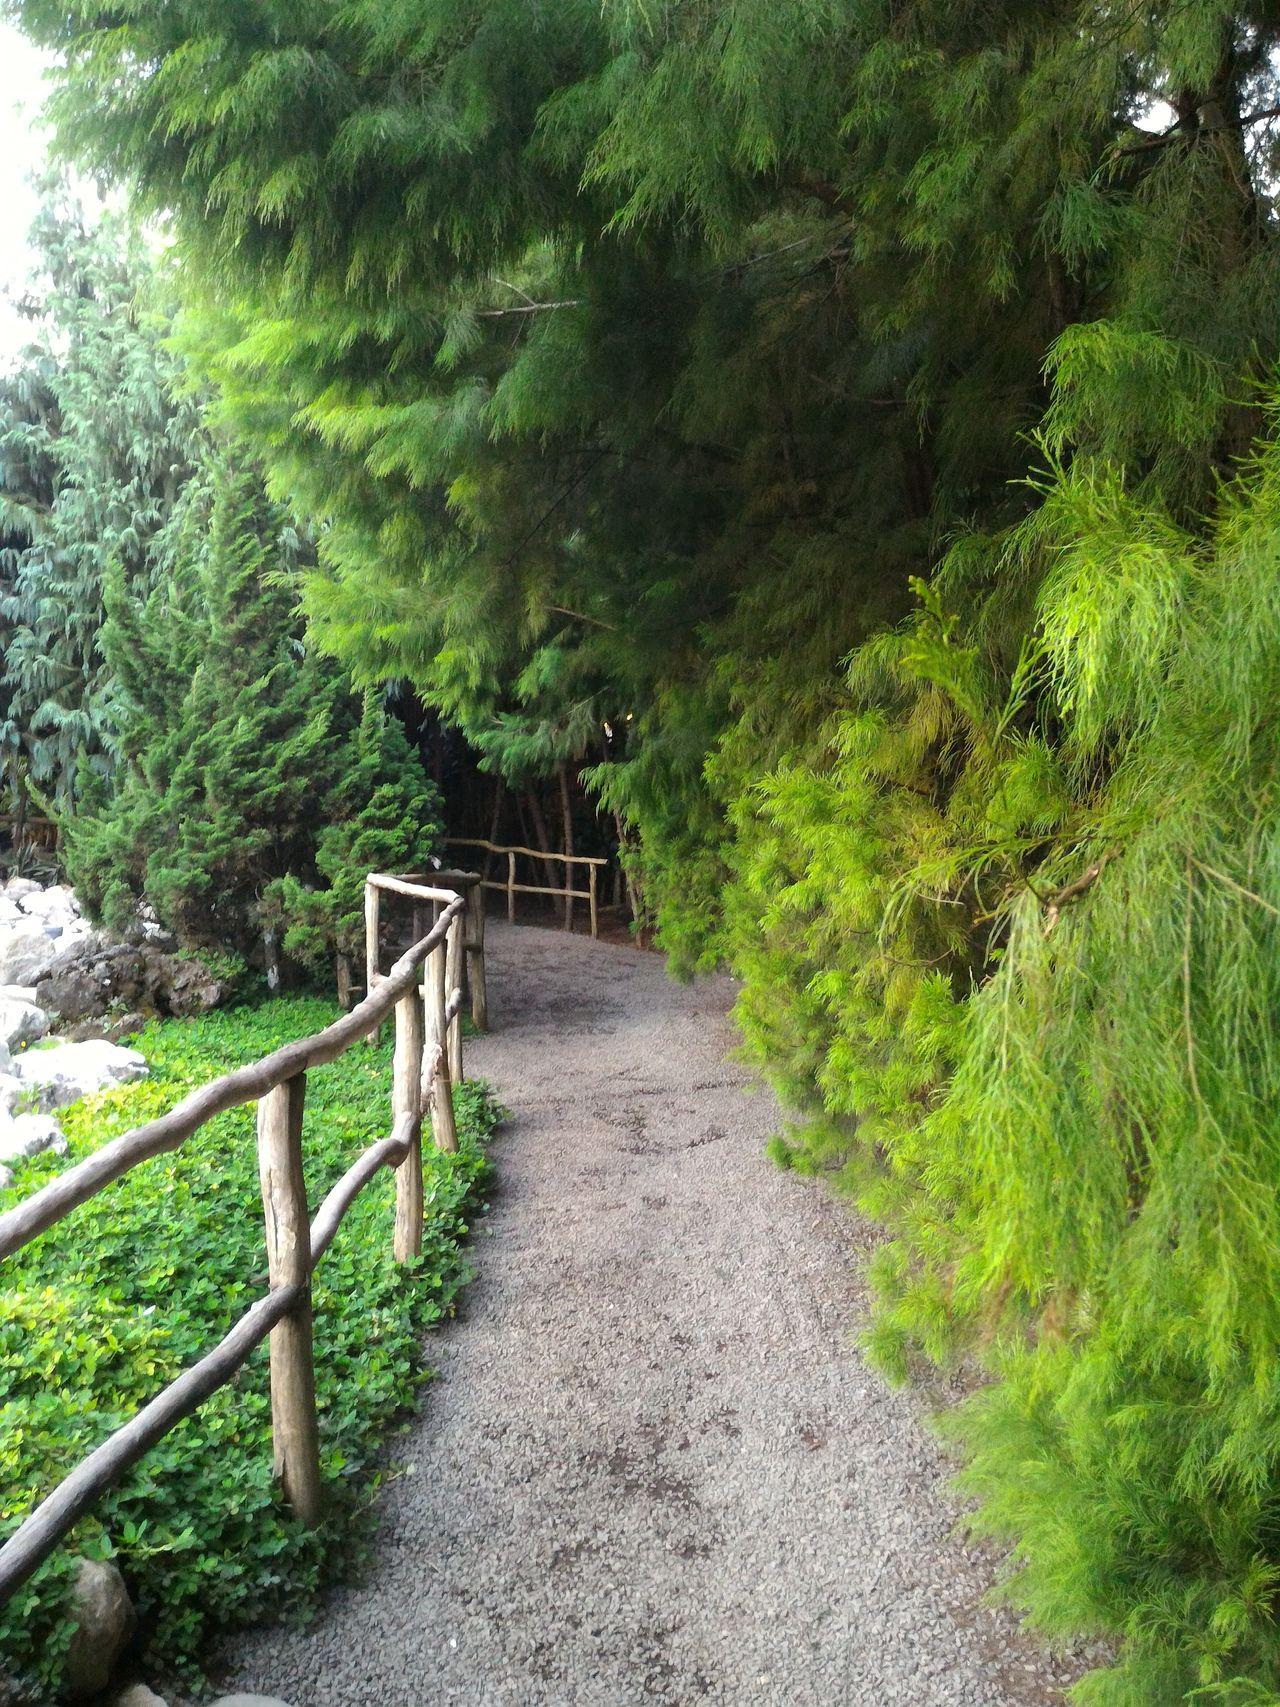 Garden Tree Stone Road Vacation Bridge